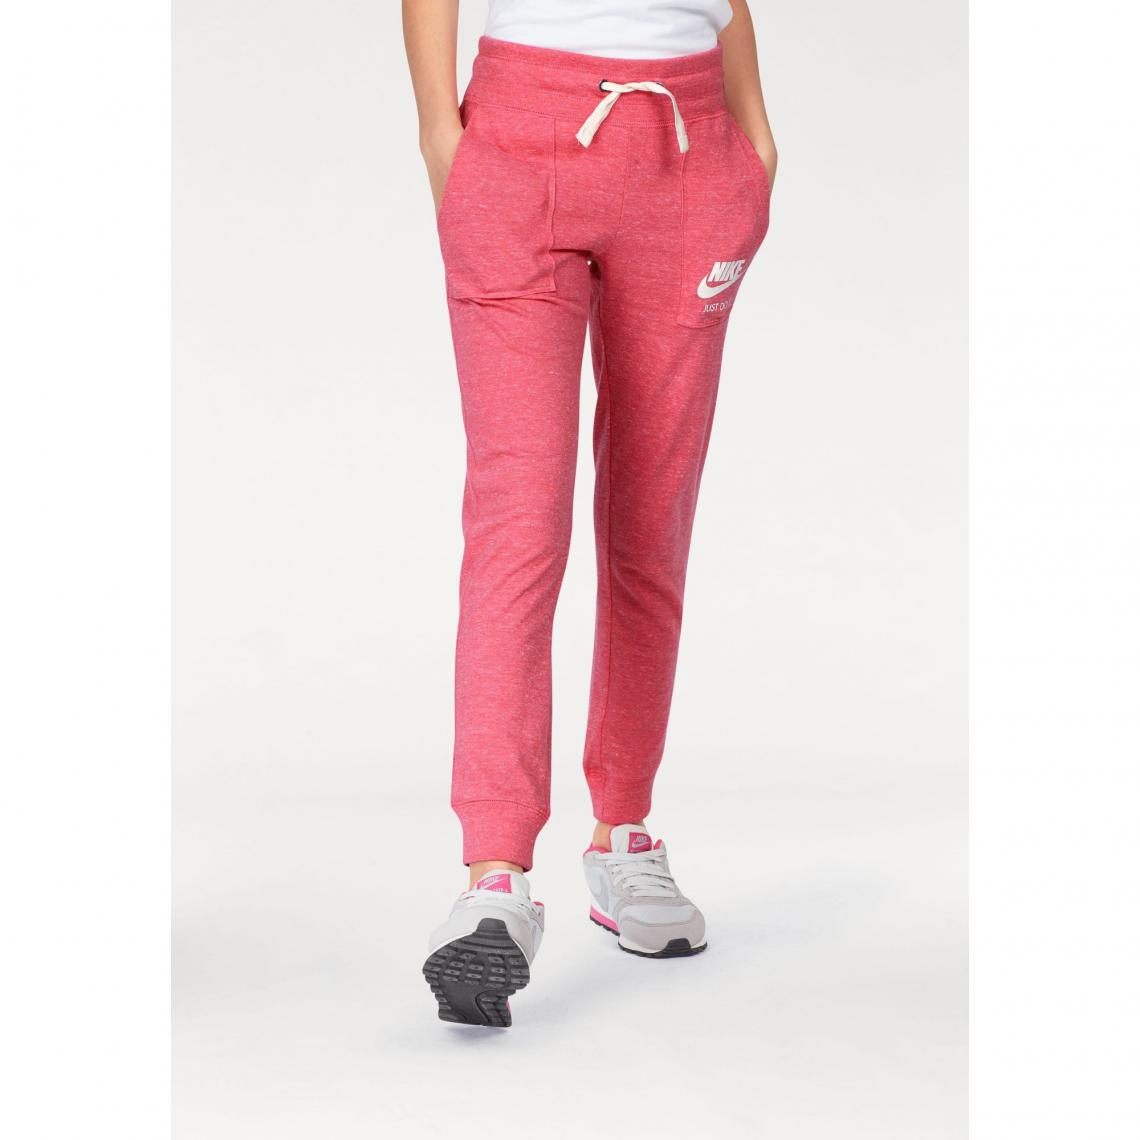 Pantalon de jogging Nike Sportswear Gym Vintage junior fille - Corail Nike  Enfant 6cbc7c954d3